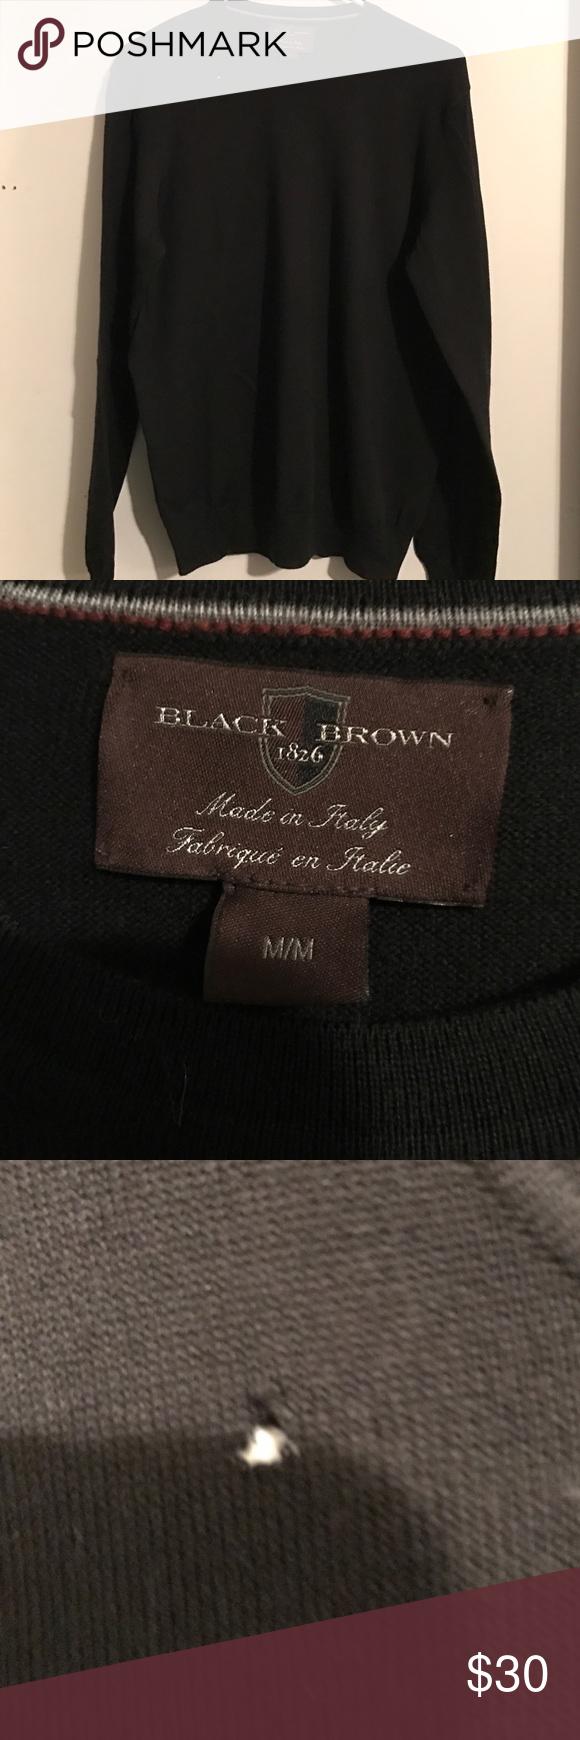 Black brown 1826 merino wool men's sweater Beautiful men's sweater ...